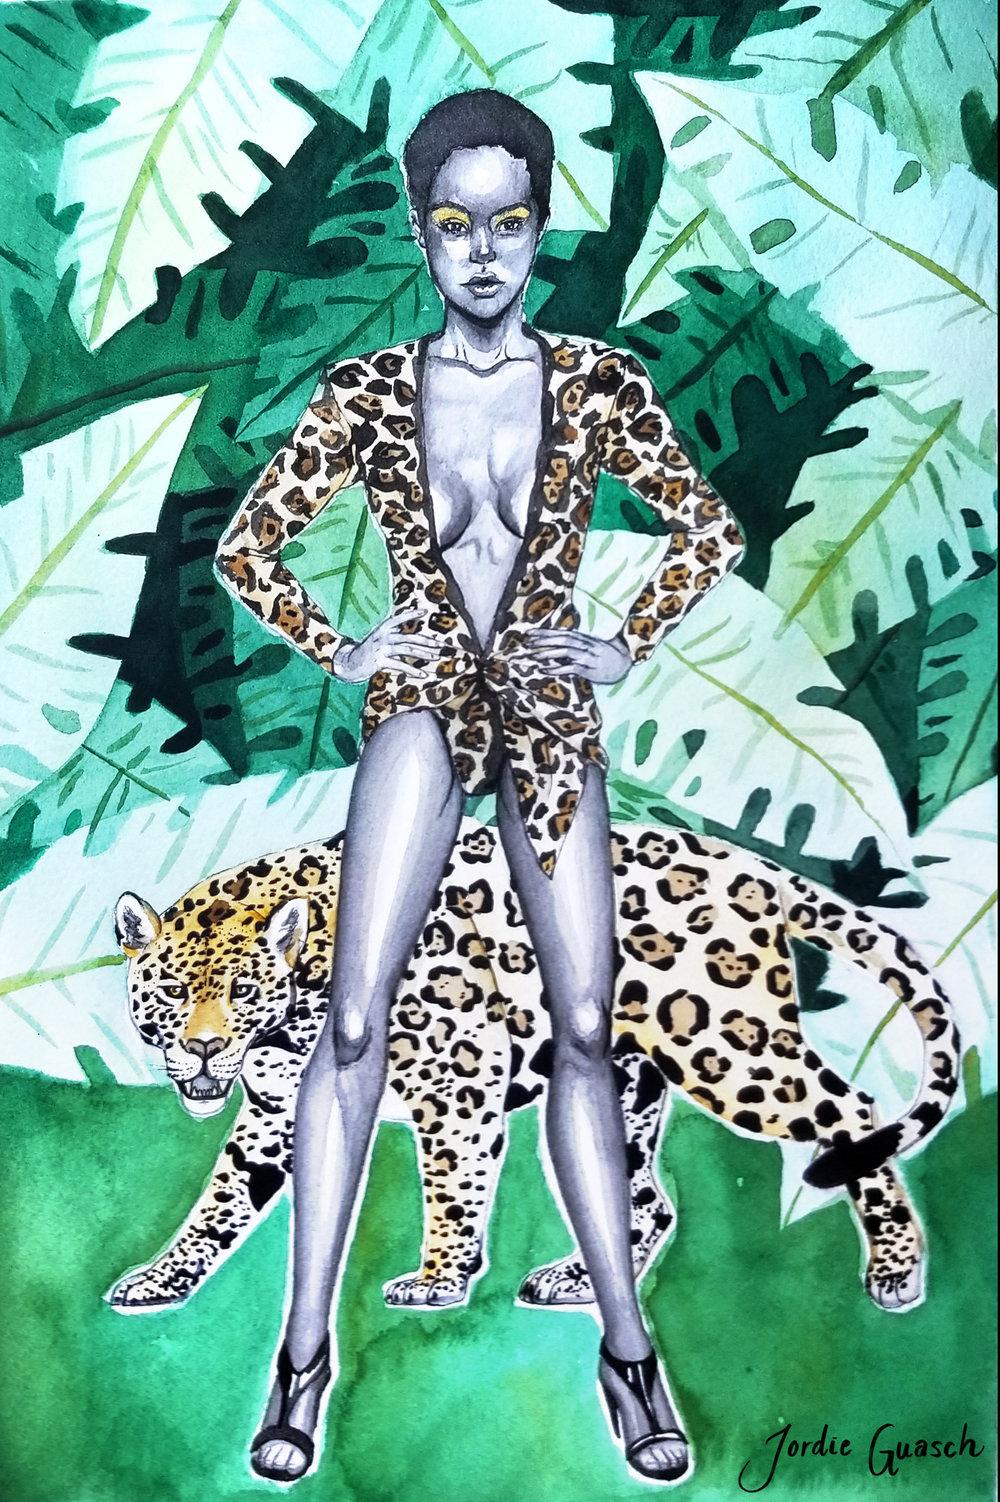 11. Saint Laurent, Watercolors